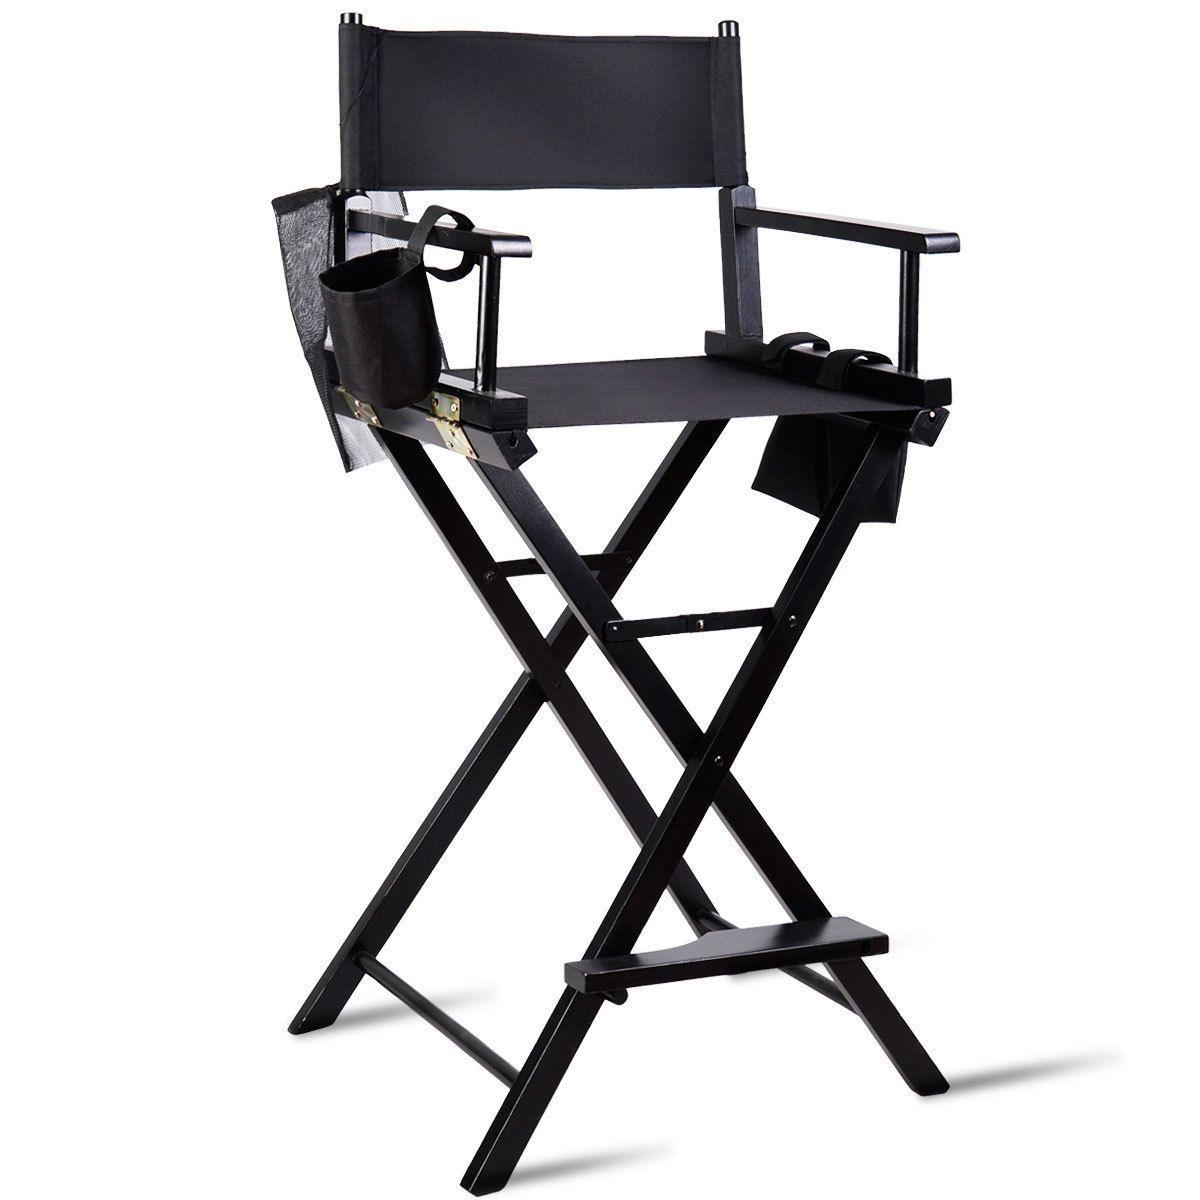 Professional Makeup Artist Foldable Chair Makeup Chair Foldable Chairs Makeup Artist Chair